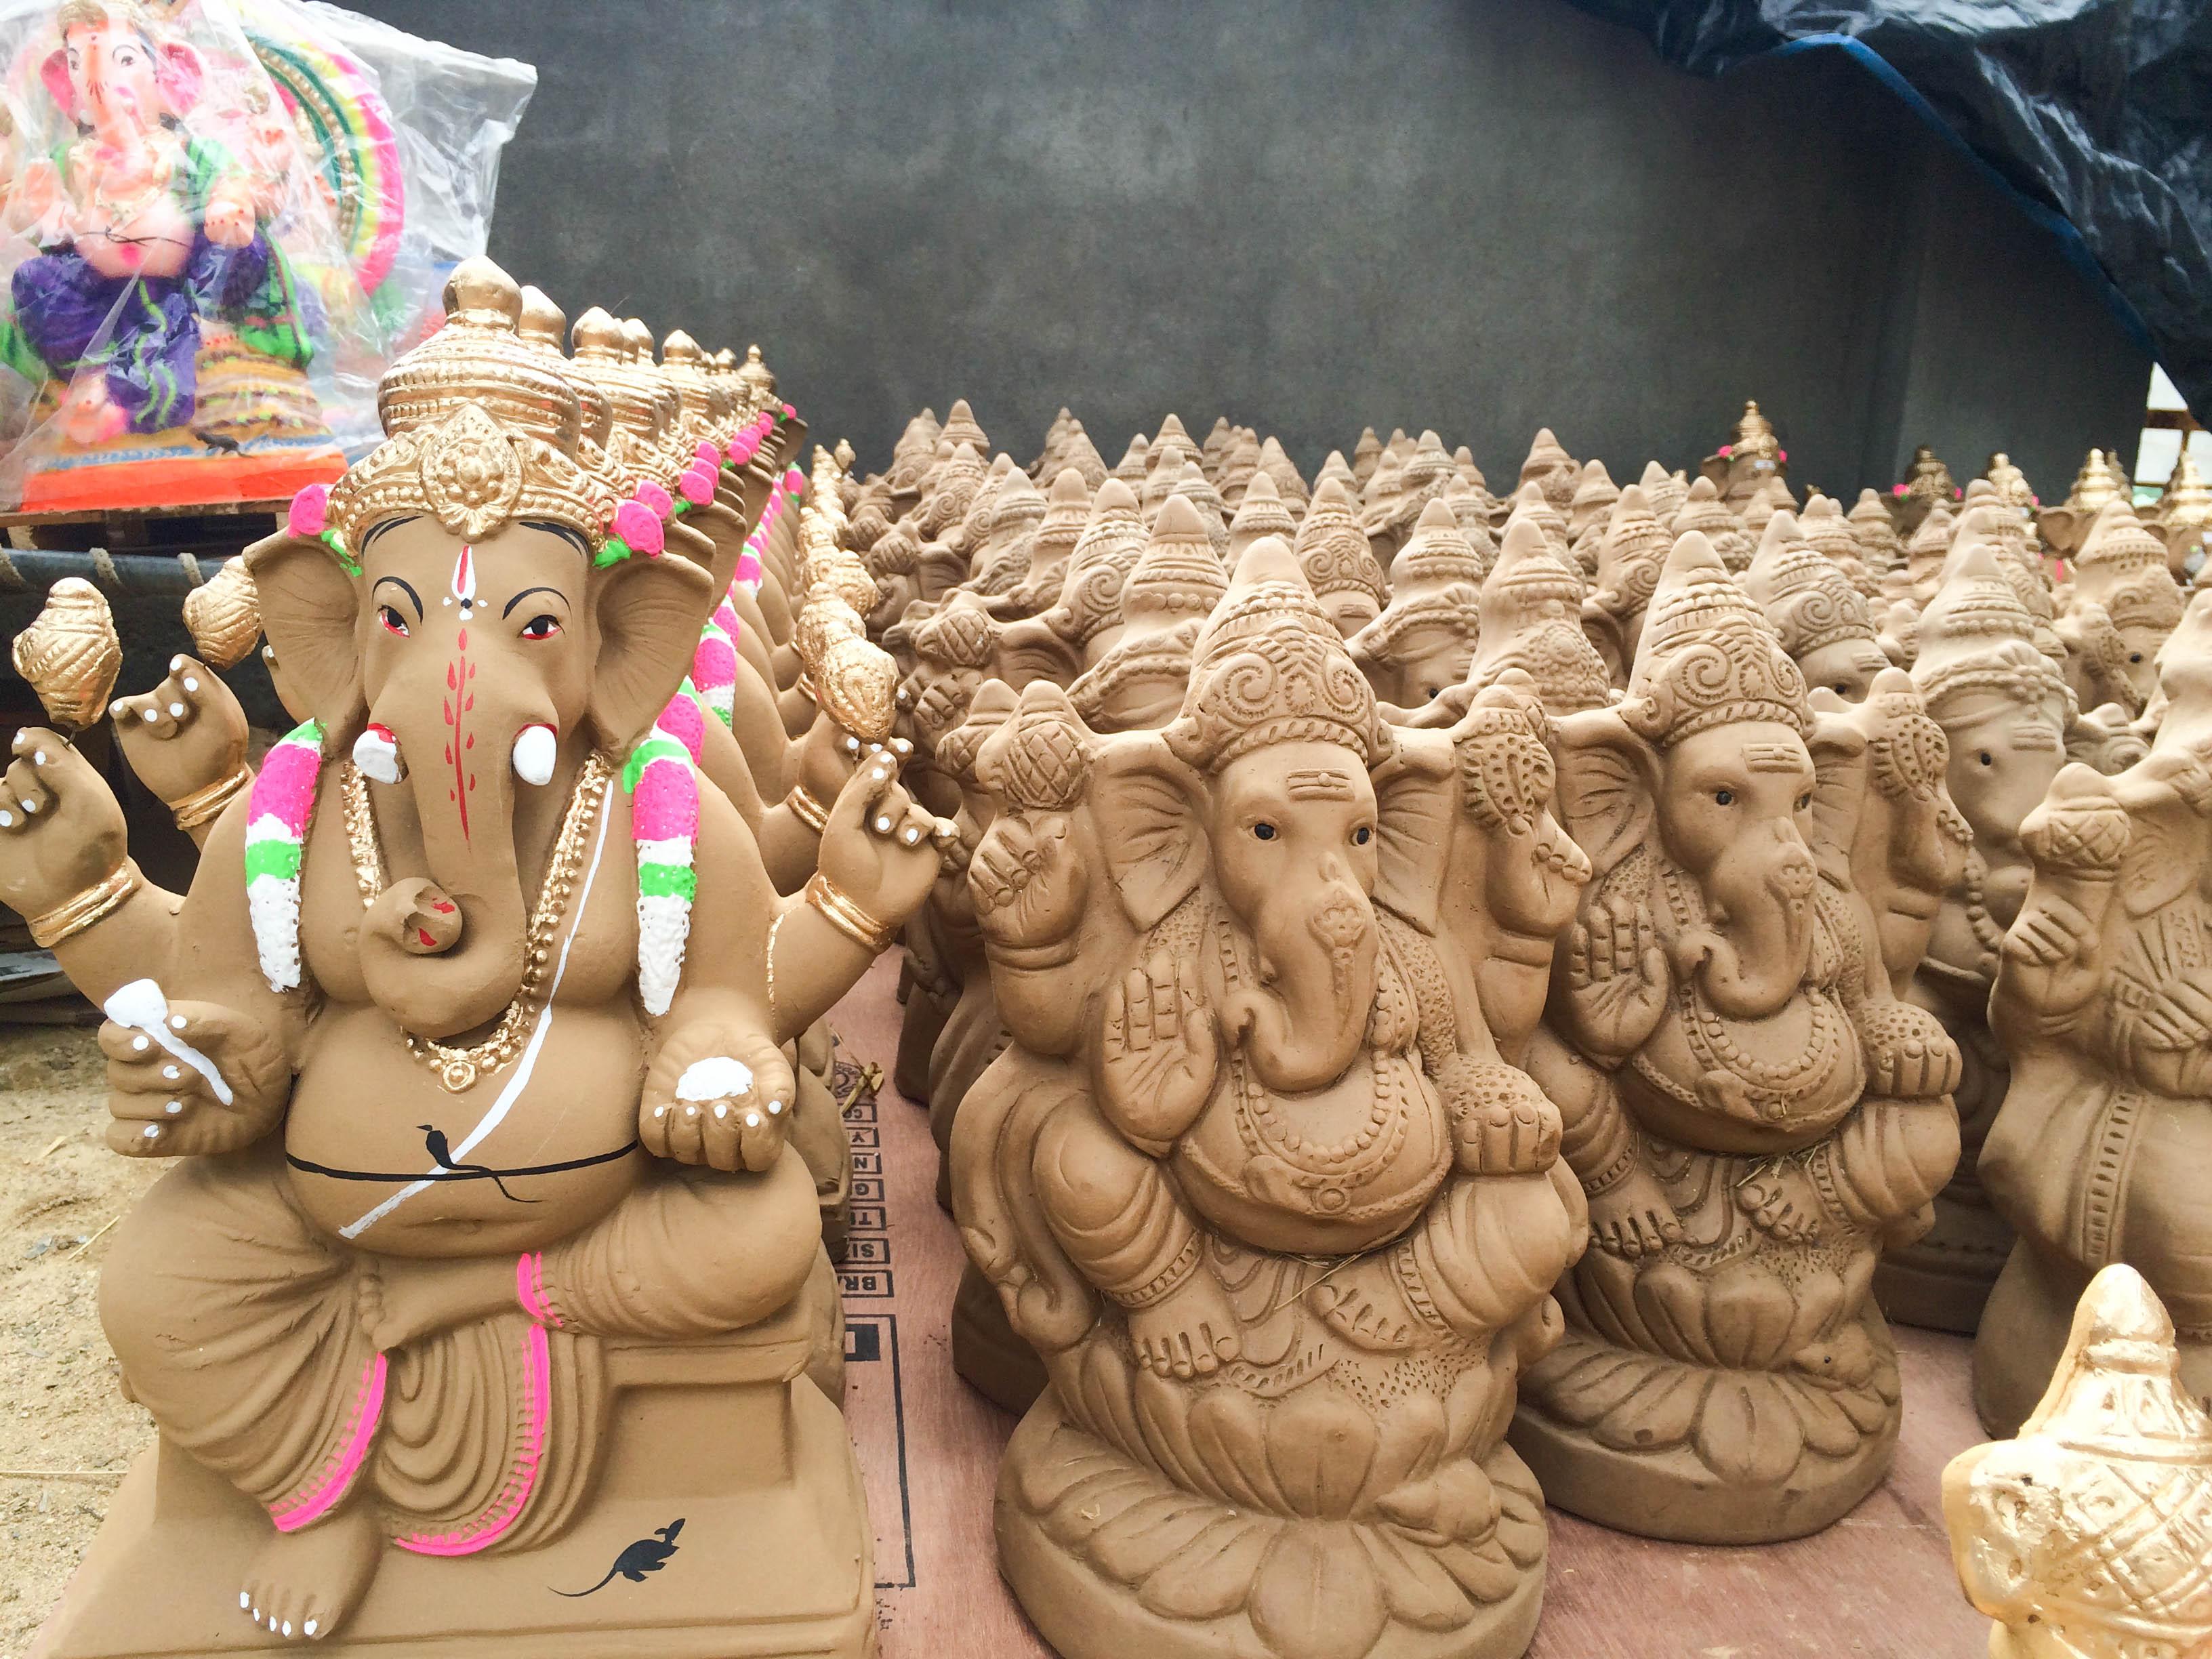 file:clay images of god ganesh on display at a ganesh chaturthi shop